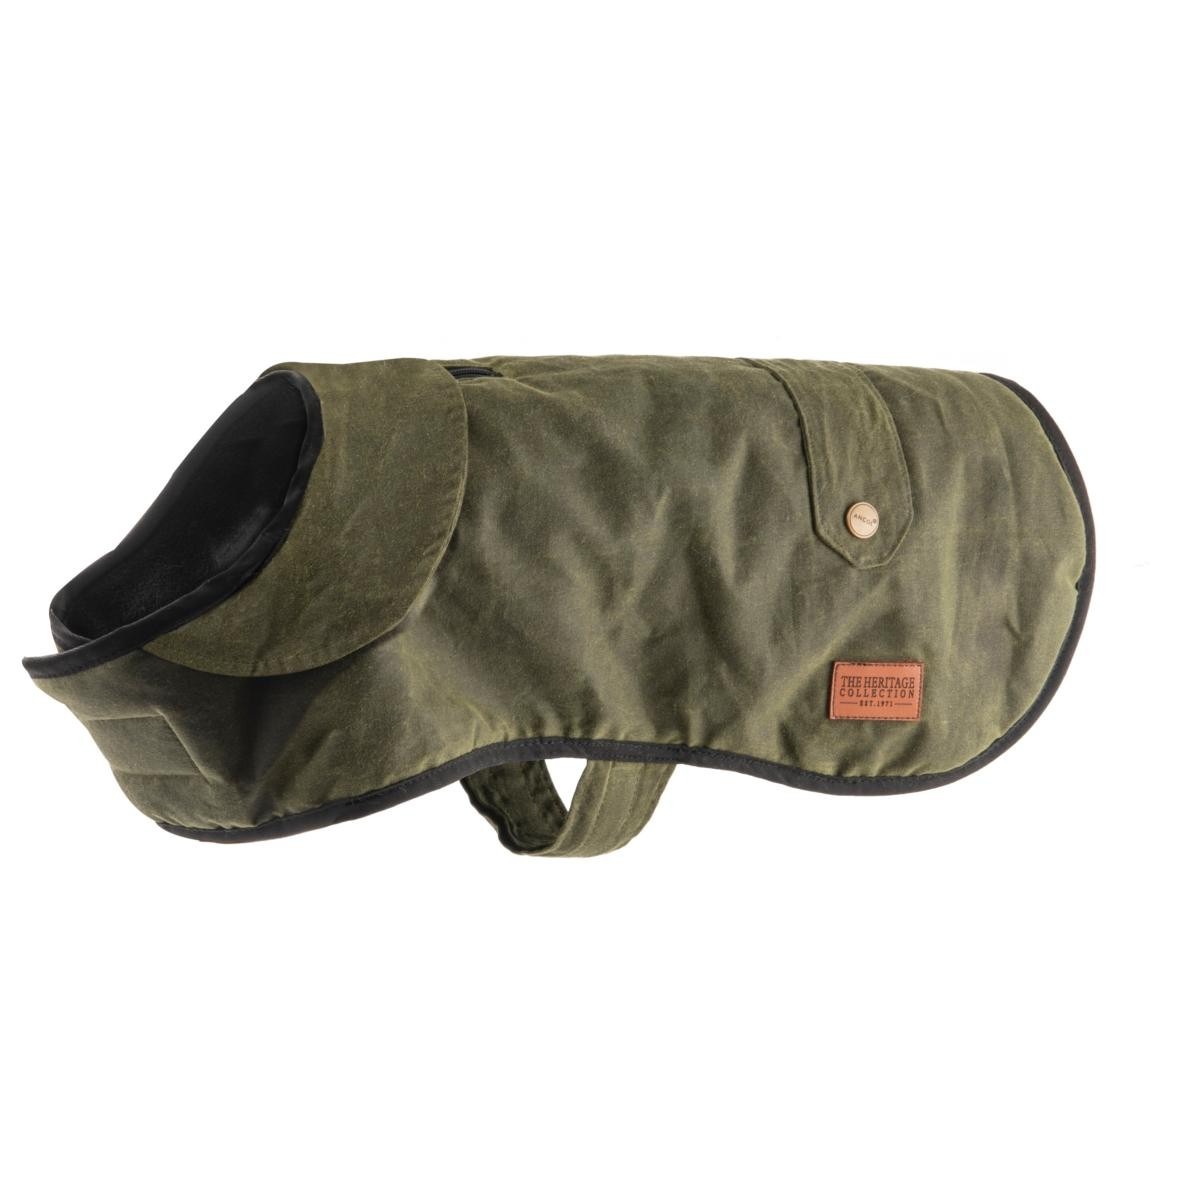 Modern Green Wax Coat